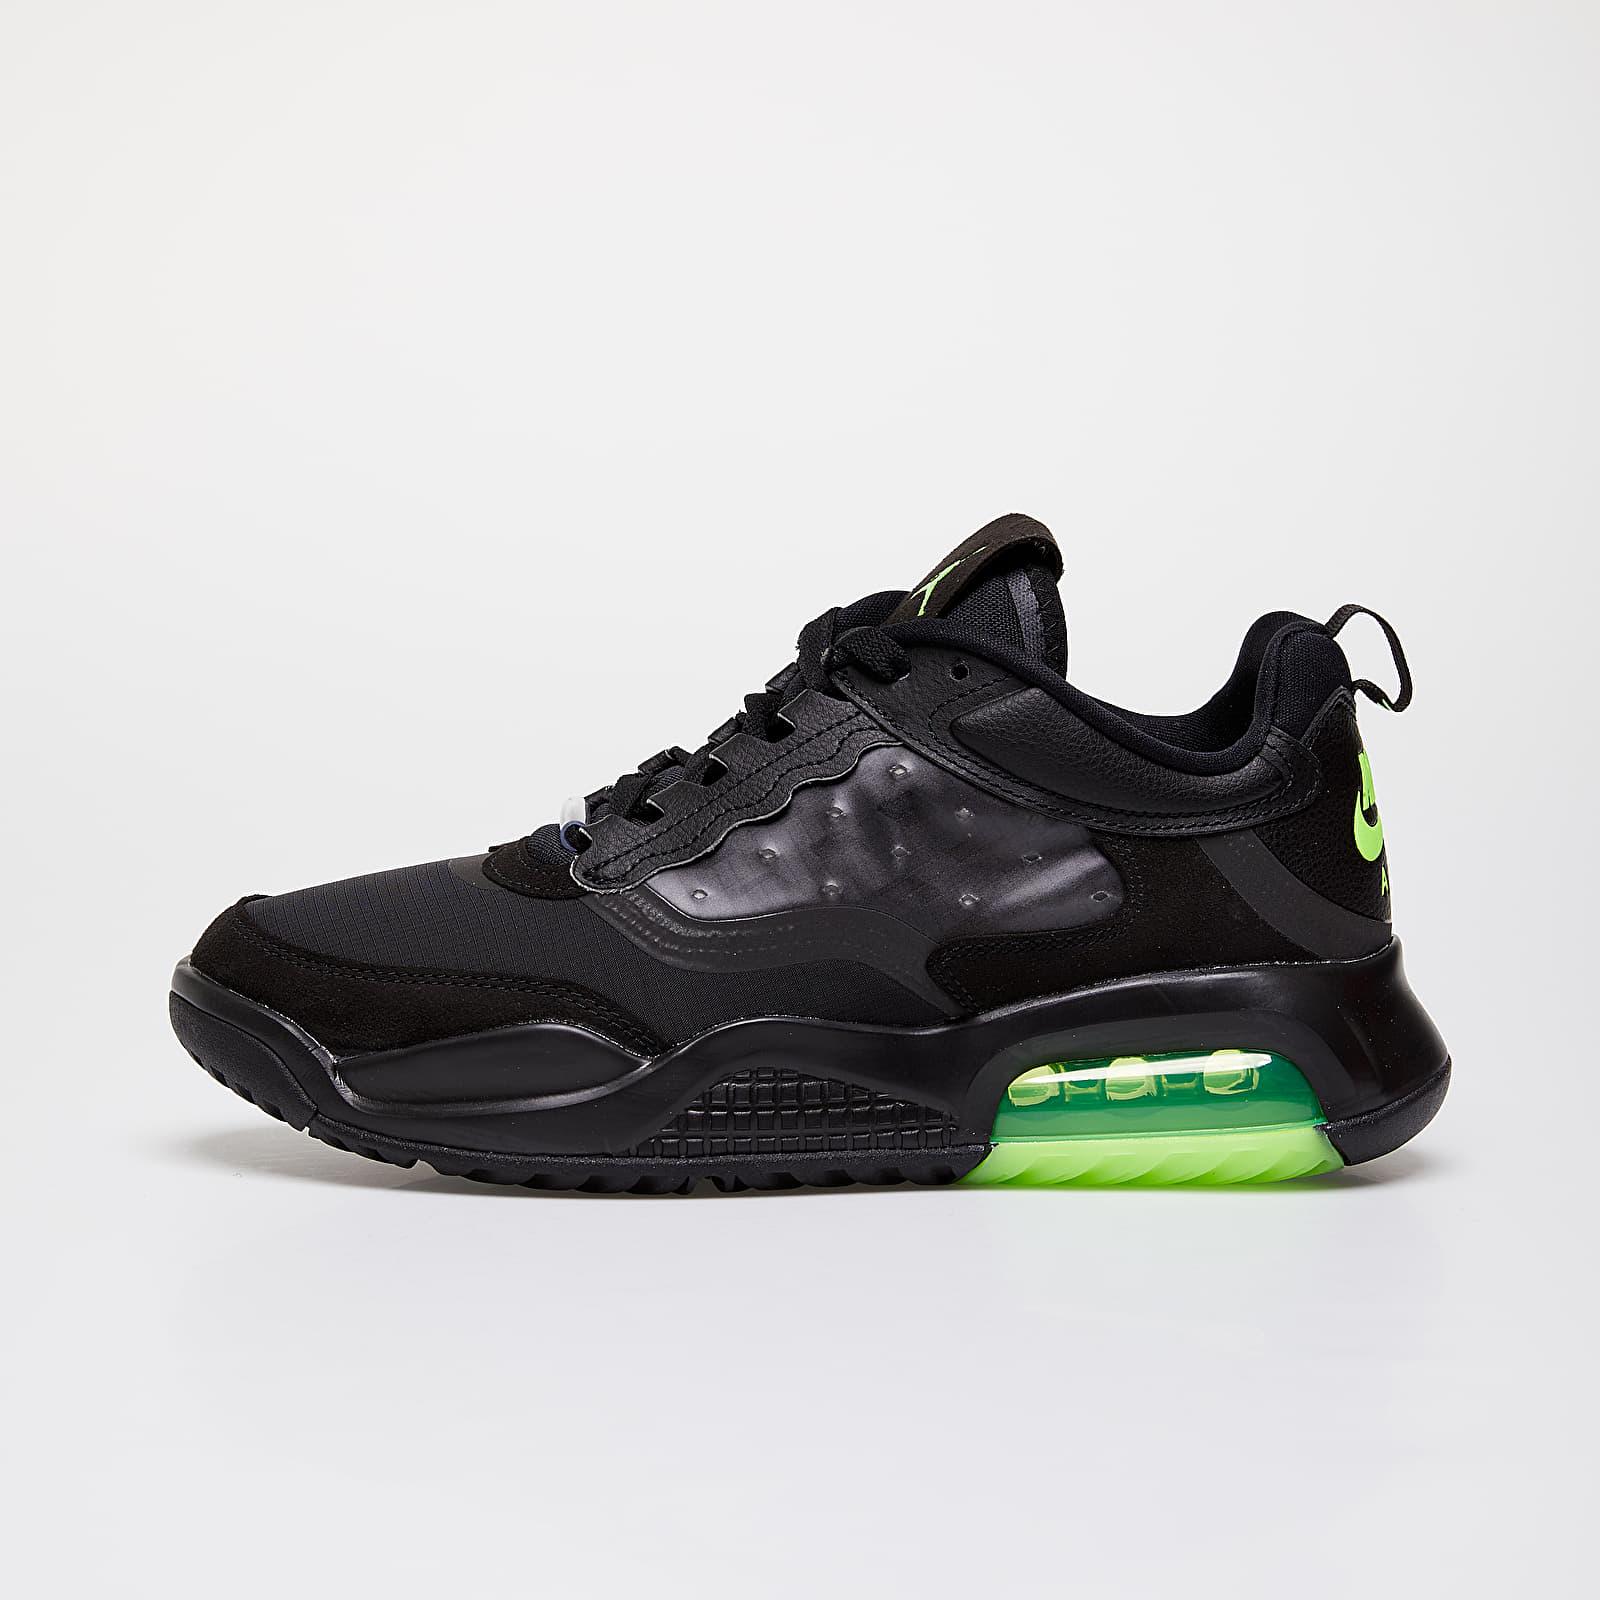 Men's shoes Jordan Max 200 Black/ Electric Green-Black